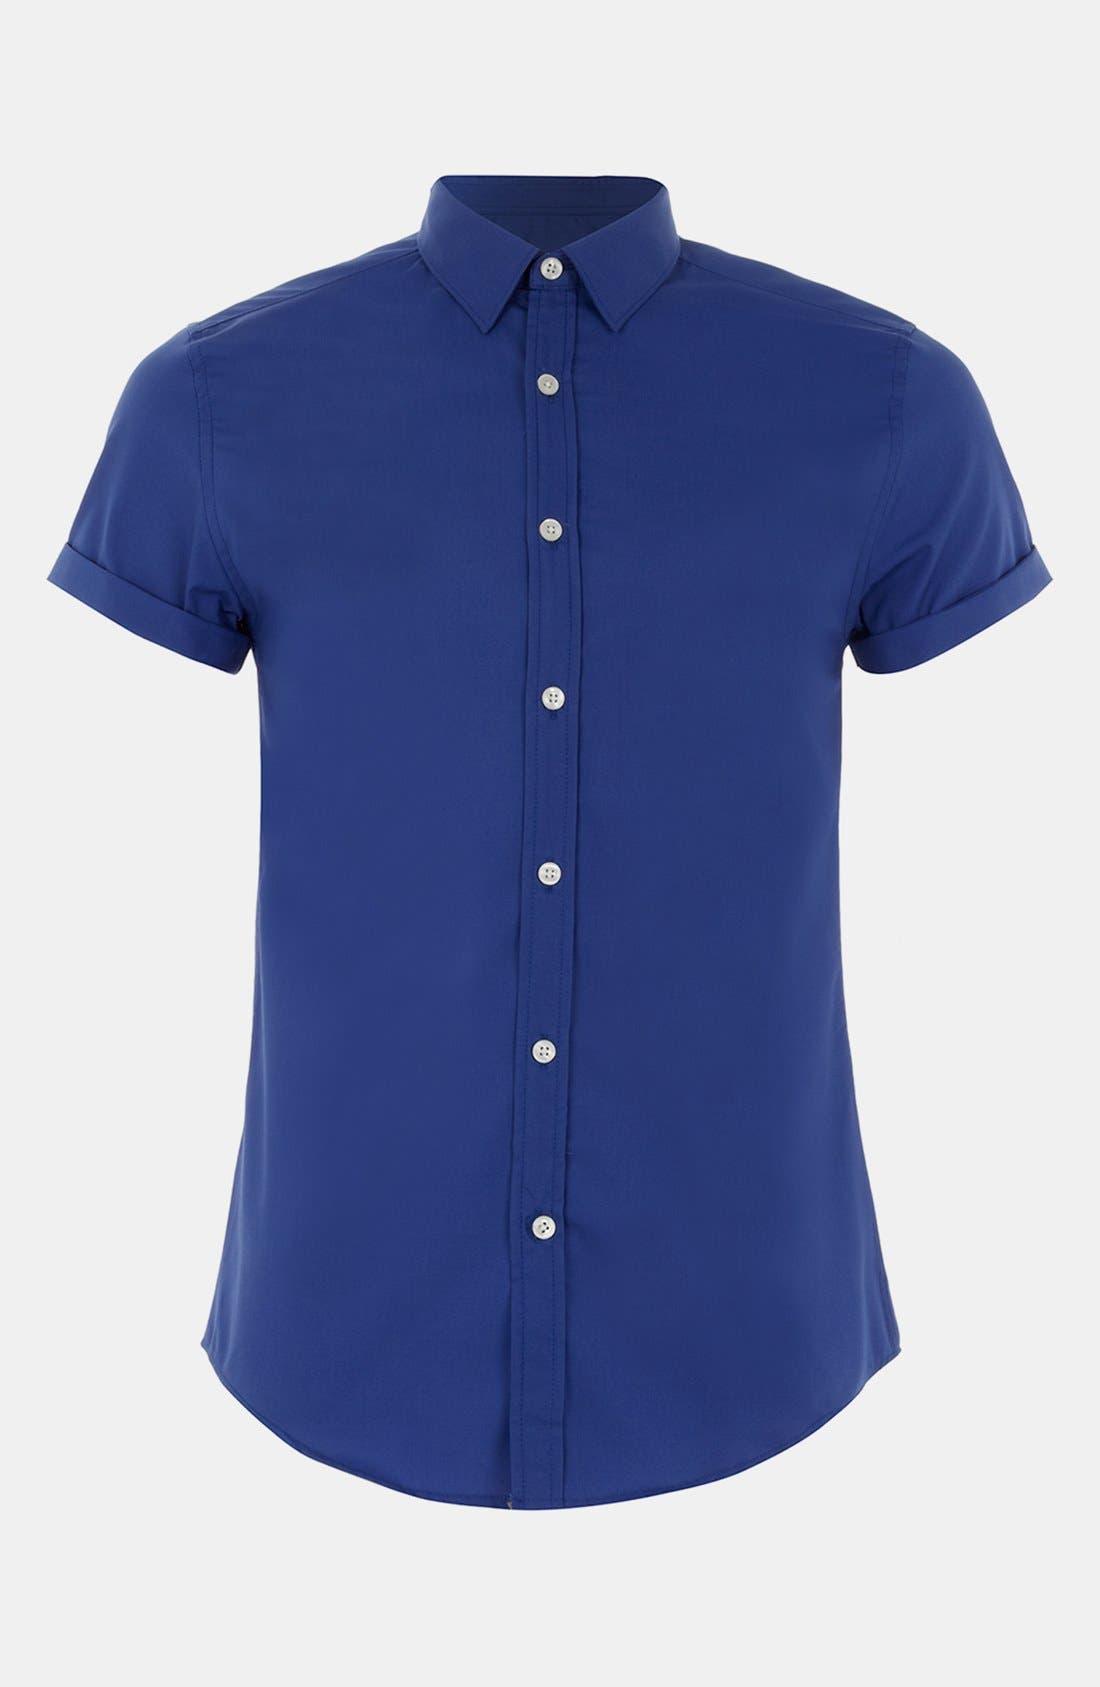 Main Image - Topman Short Sleeve Shirt